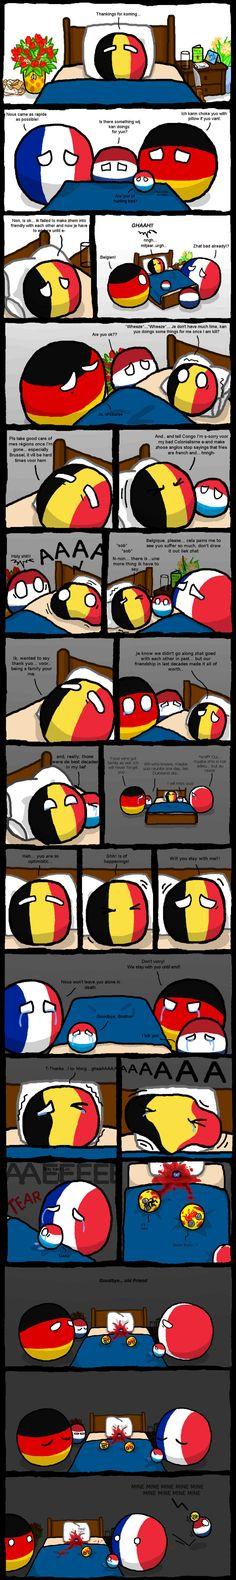 Draw Polandball Or Countryball Art Or Comics For You By Komradblin